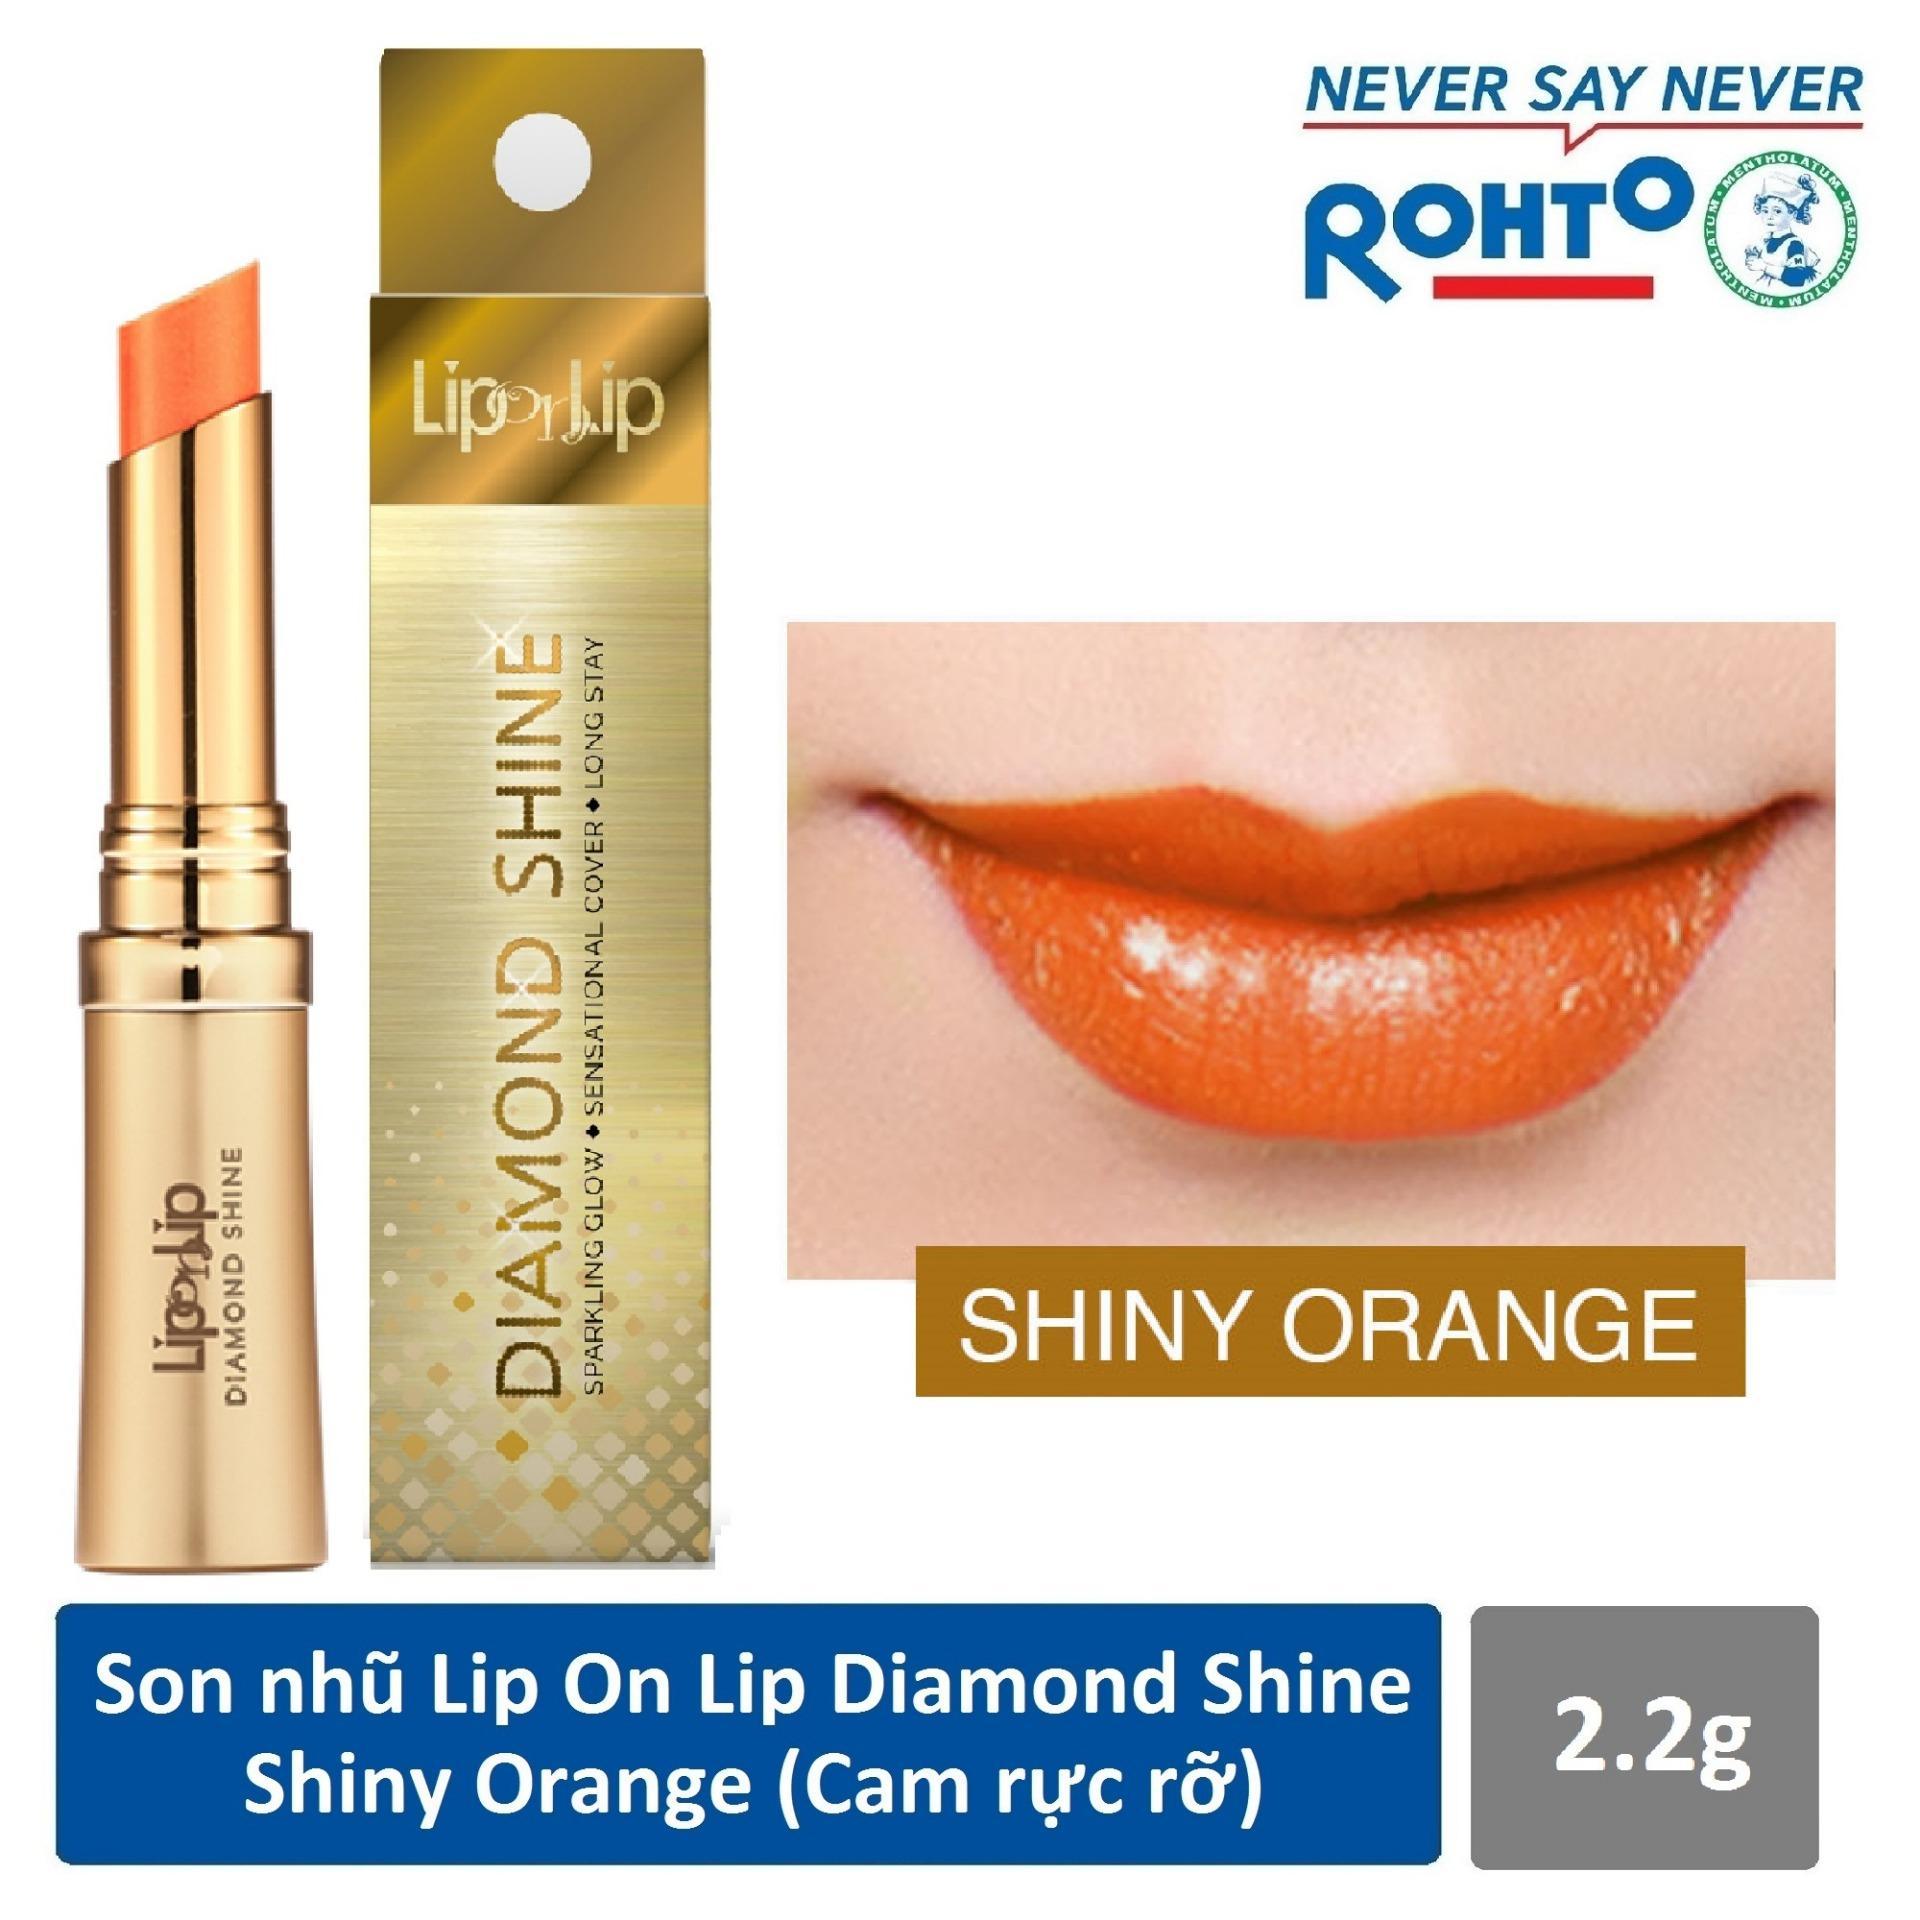 Son nhũ Lip On Lip Diamond Shine Shiny Orange 2.2g (Cam rực rỡ) tốt nhất